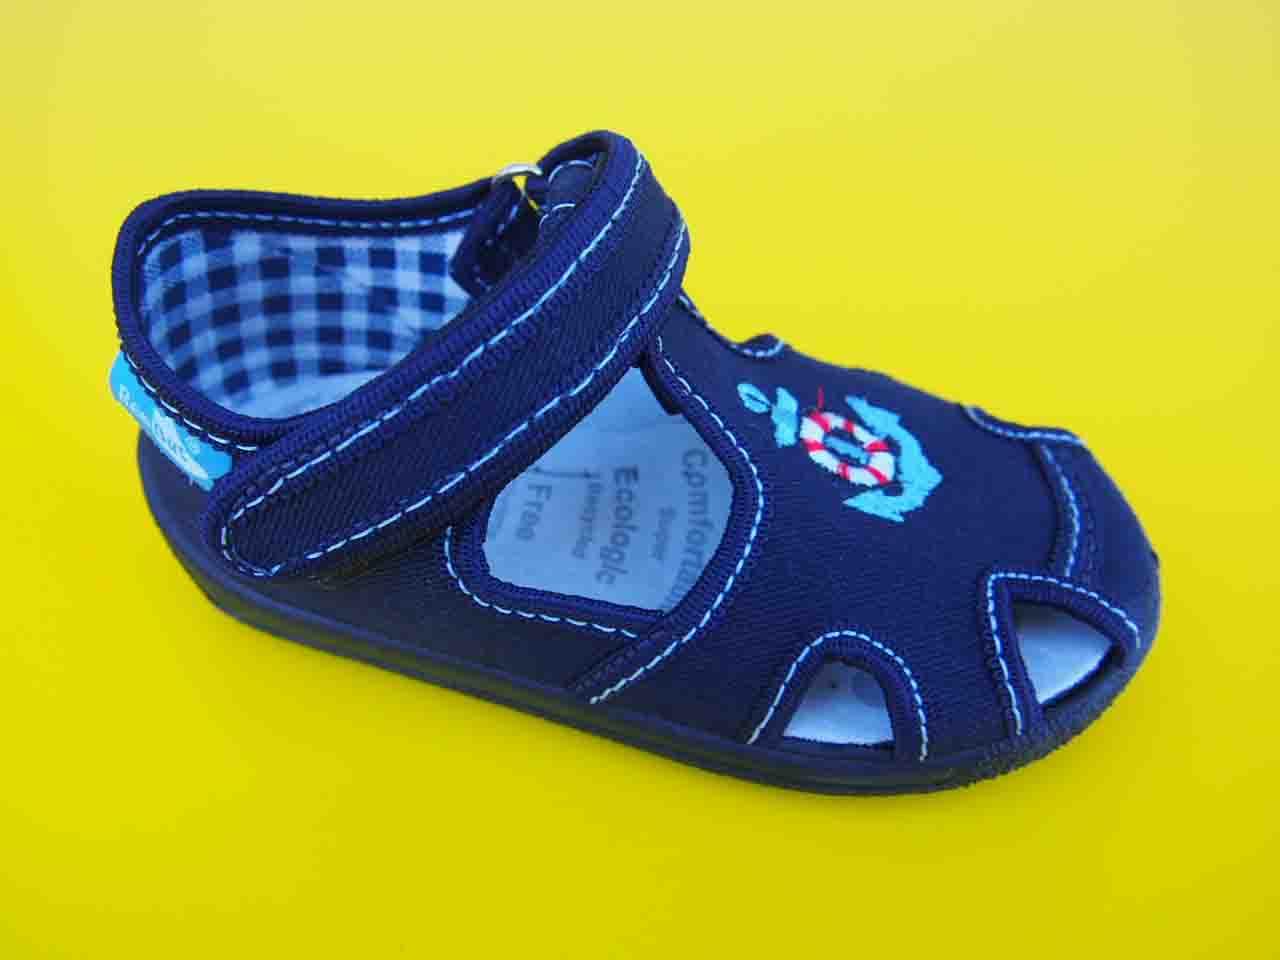 3fb2af96f3 Detské papučky Renbut - tmavé s kotvami empty